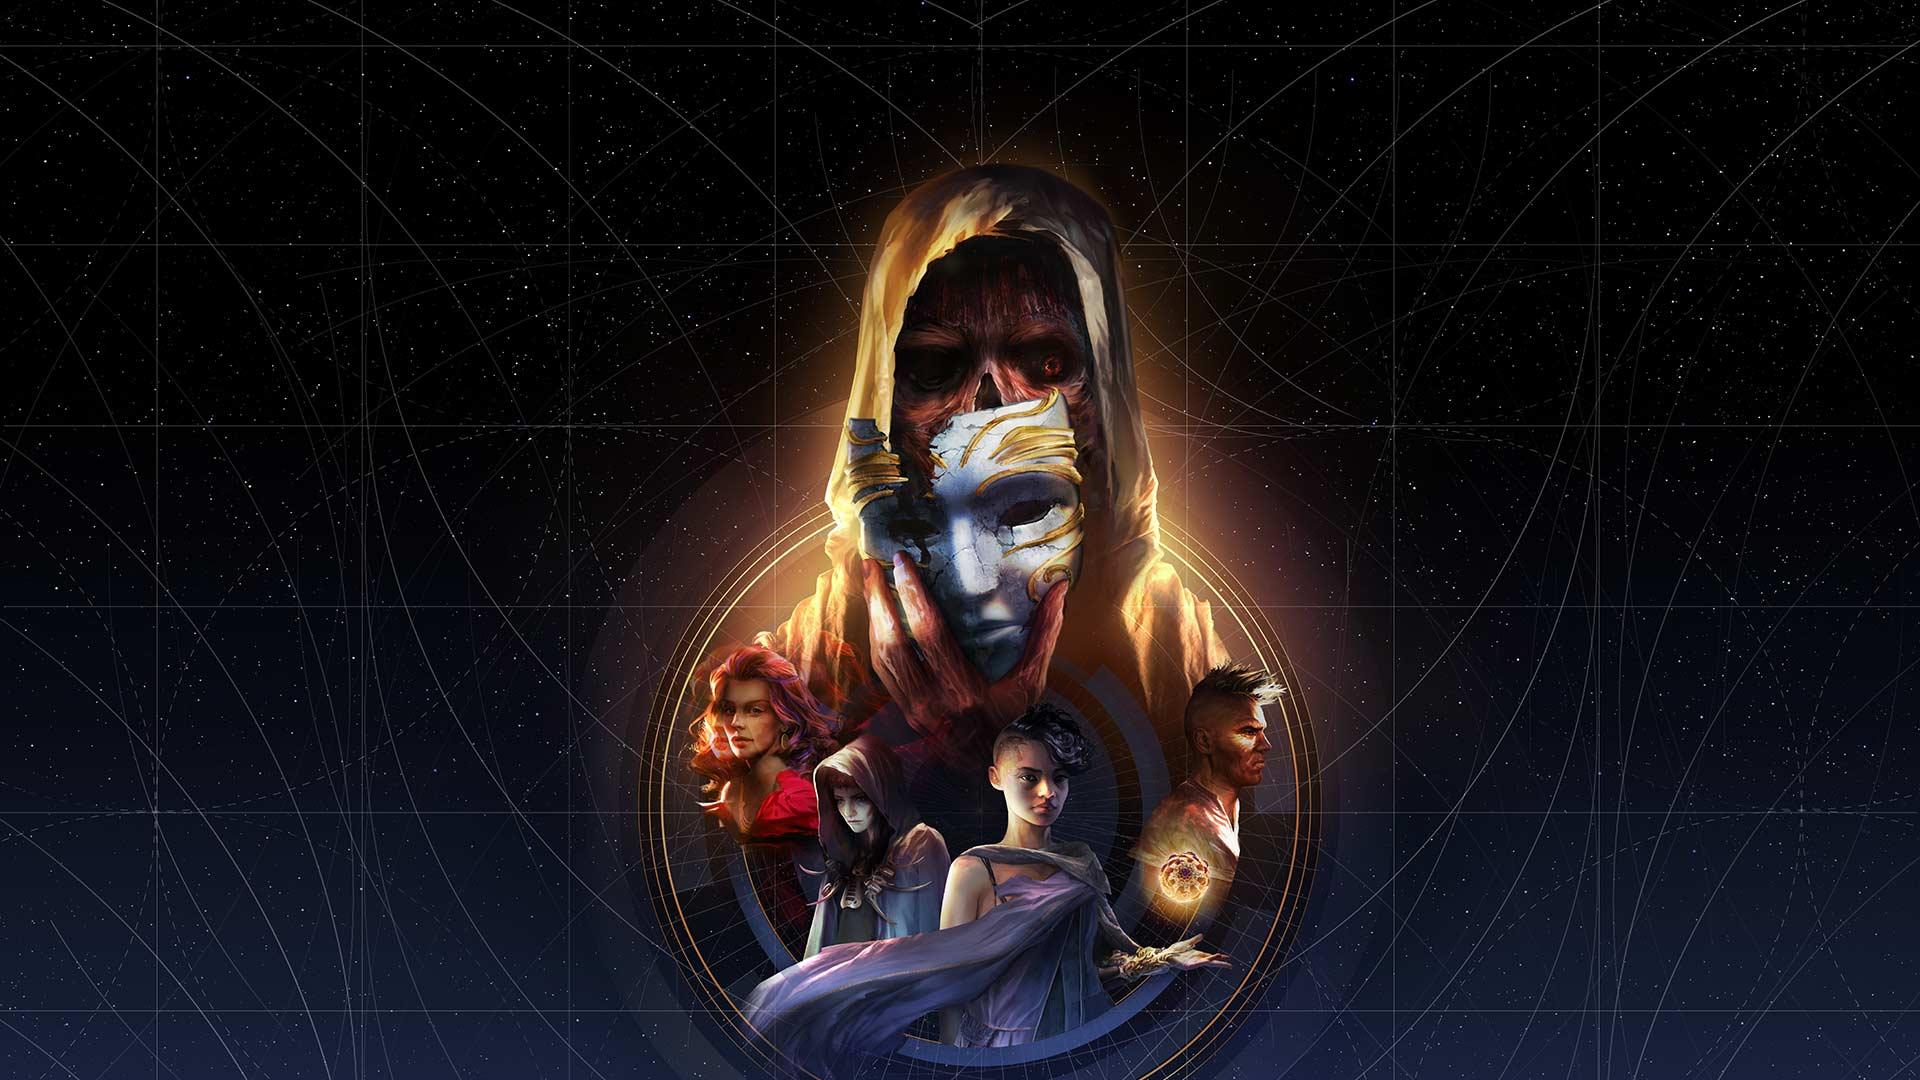 Torment: Tides of Numenera появилась в Xbox Game Pass | RBK Games